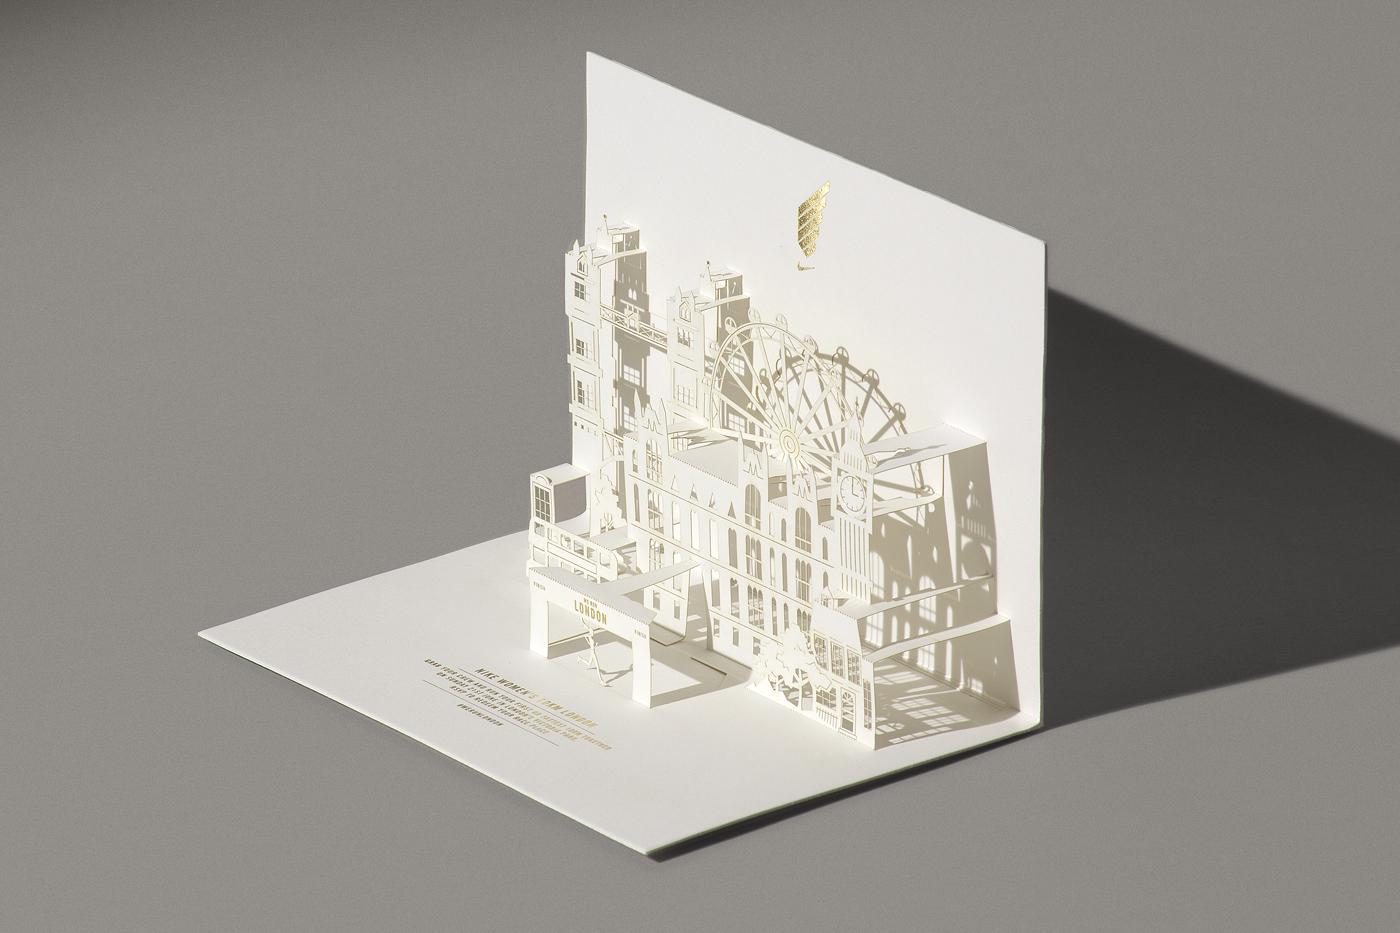 Nike Happycentro kirigami papercut invite